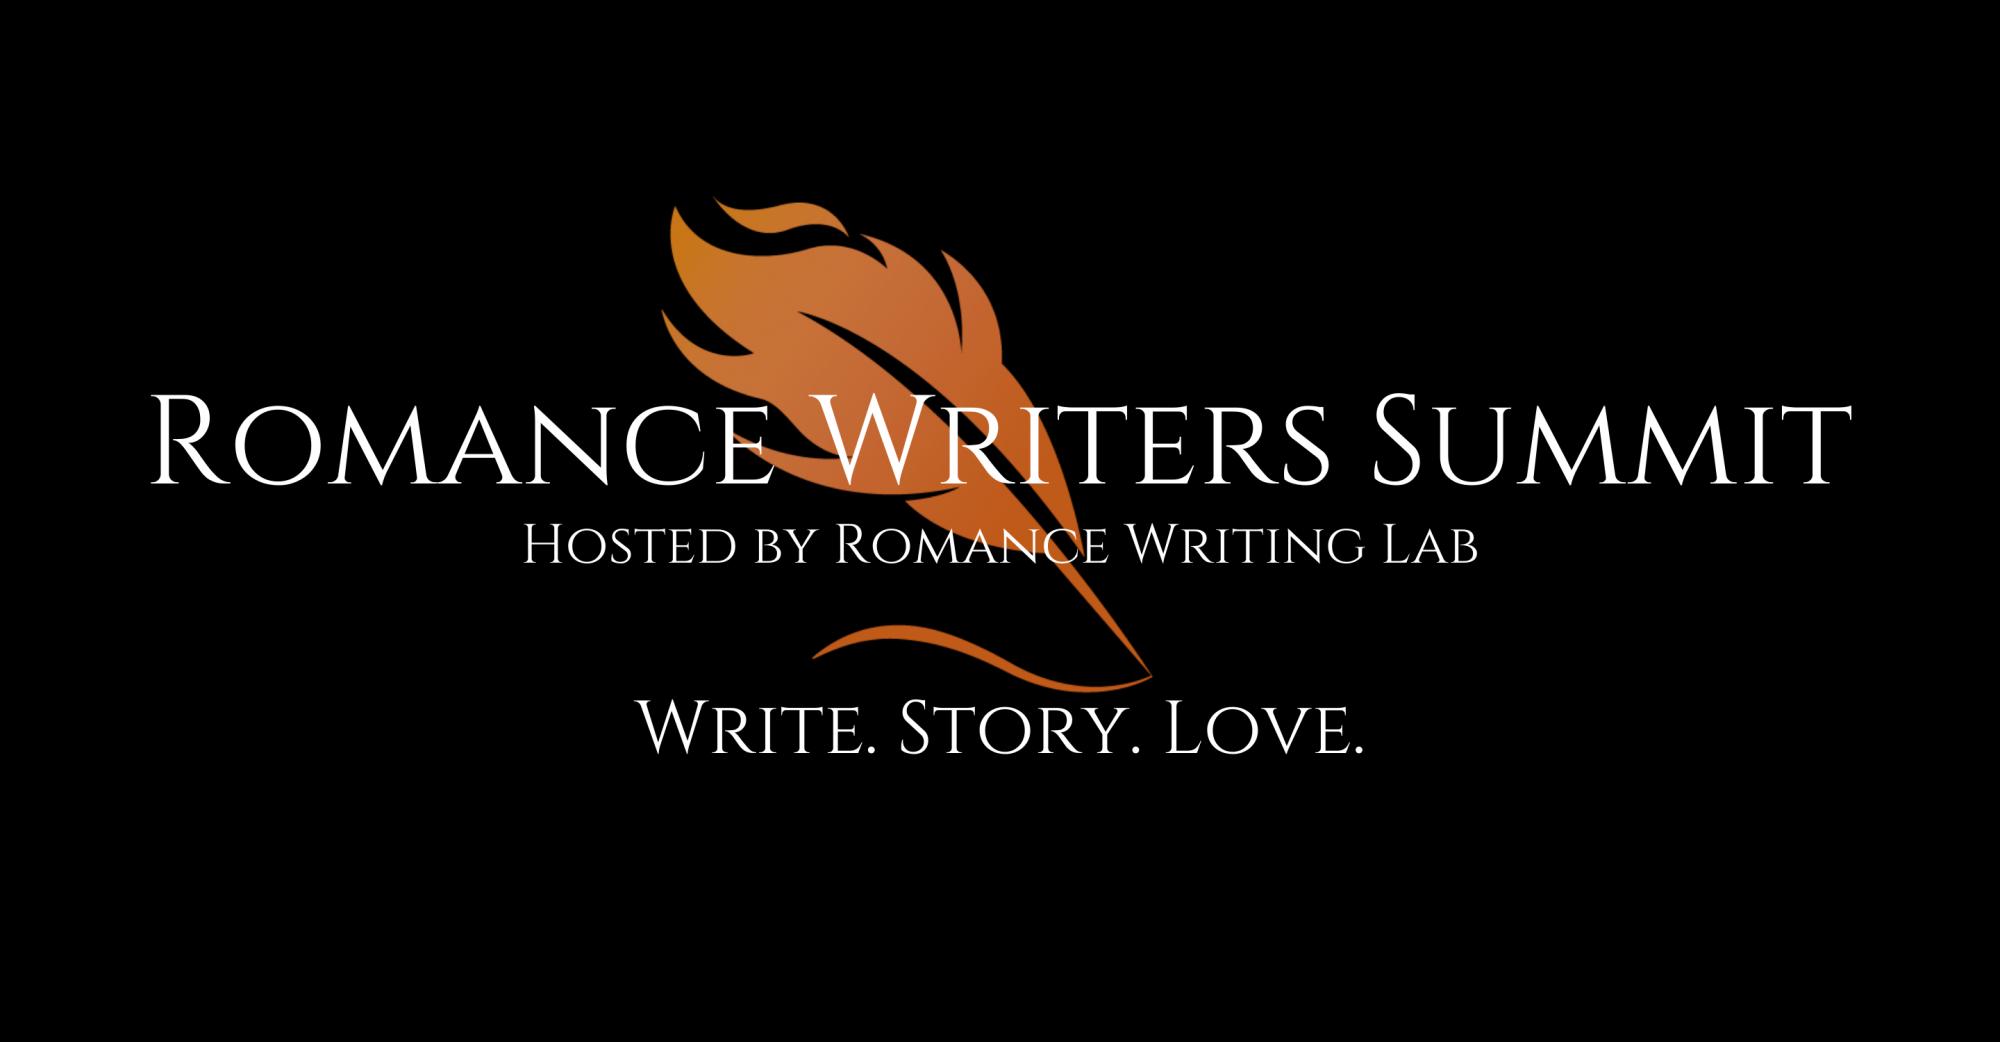 Romance Writers Summit logo Hosted by Romance Writing Lab